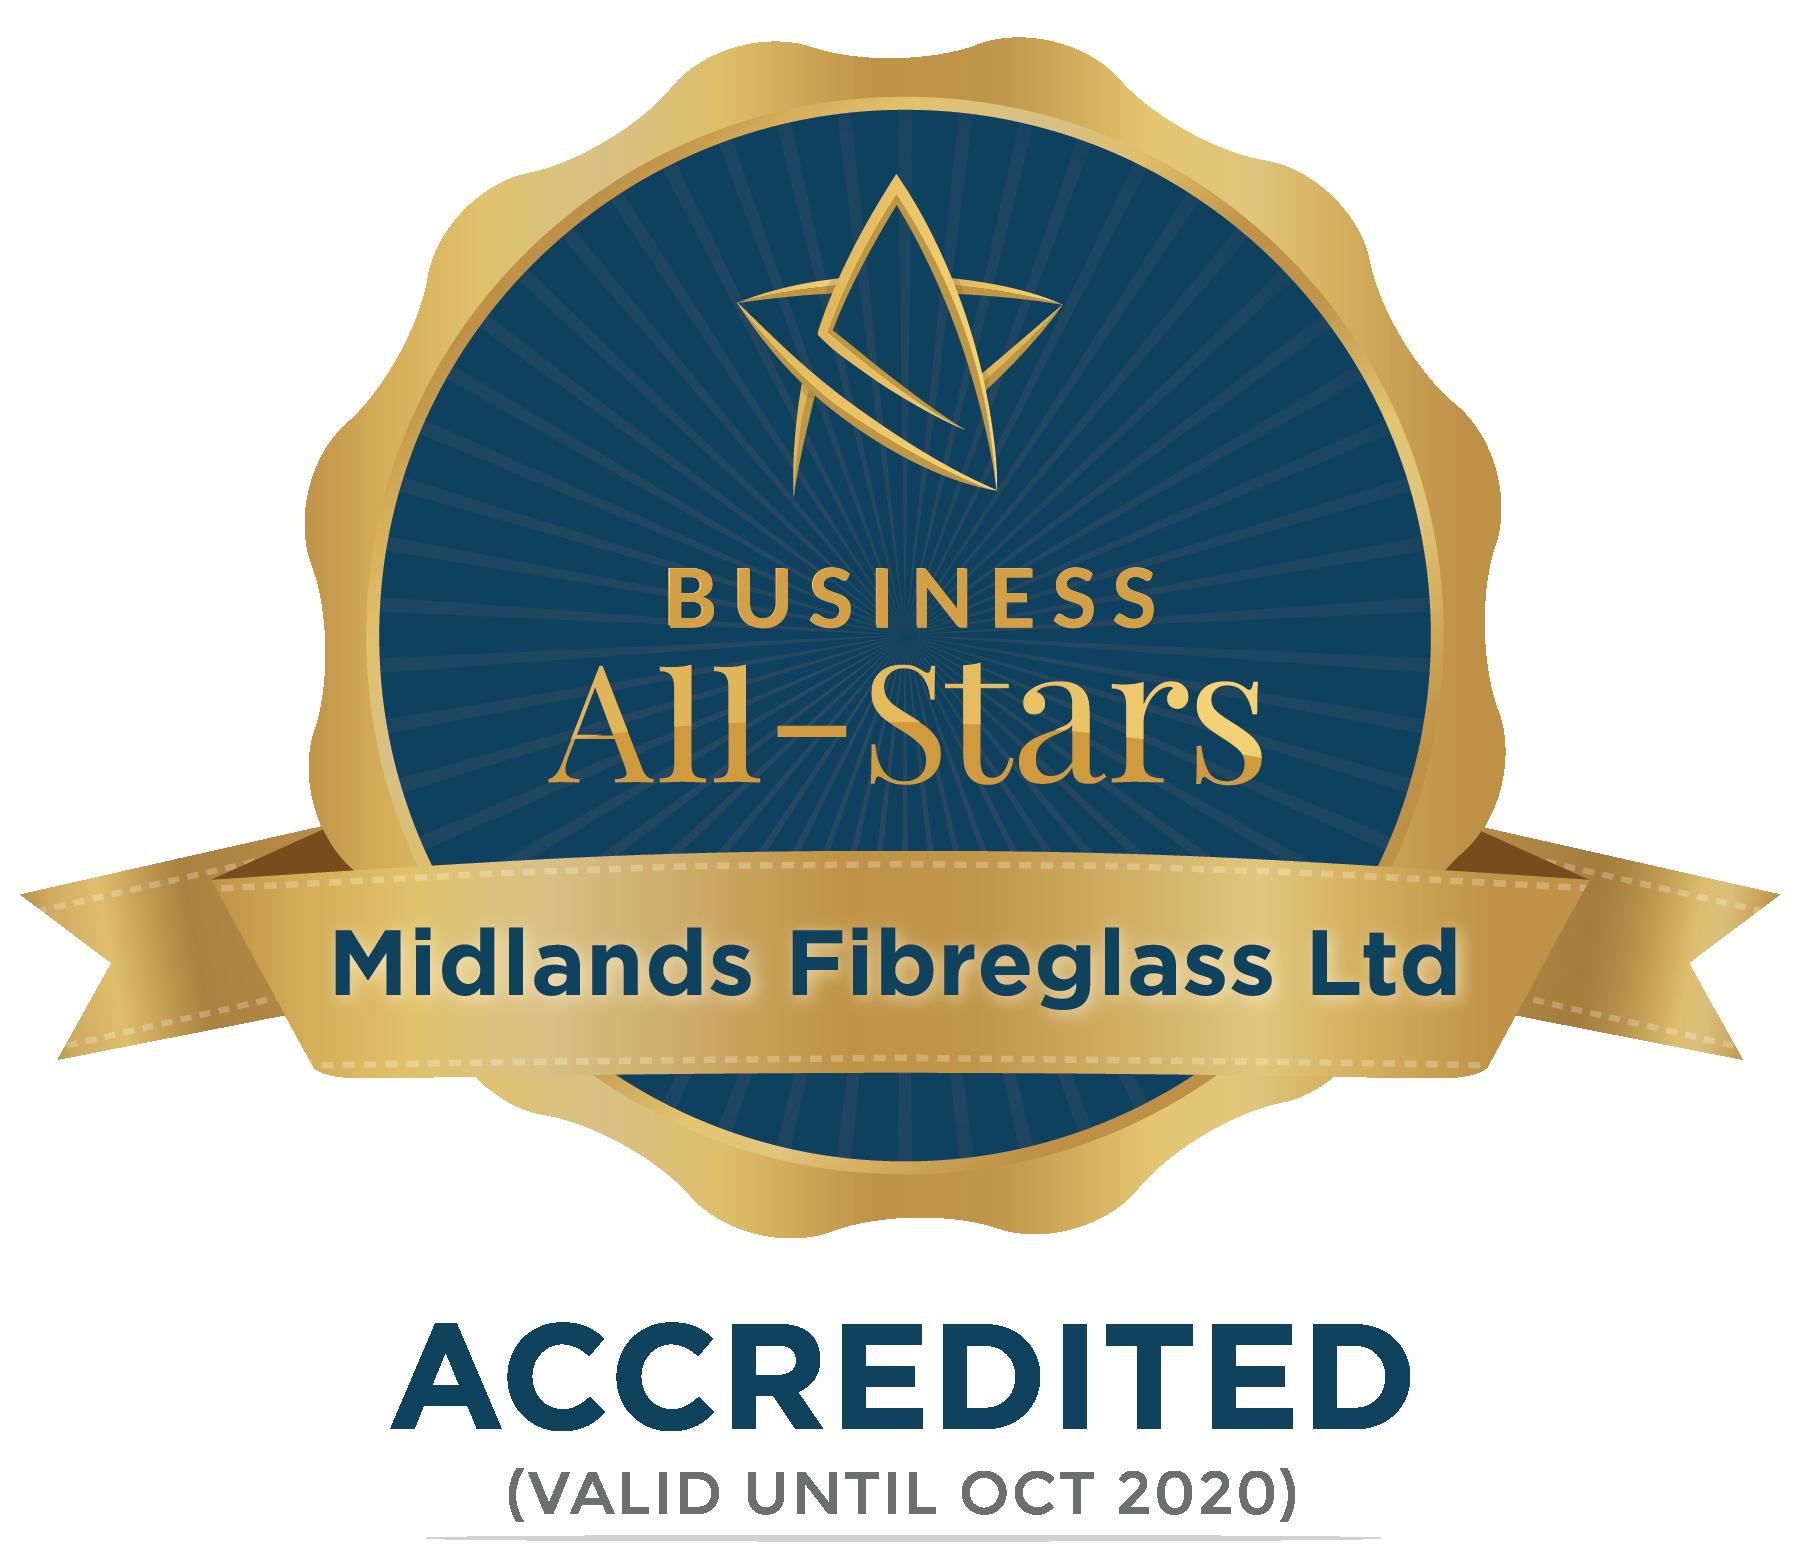 Midlands Fibreglass Ltd - Business All-Stars Accreditation